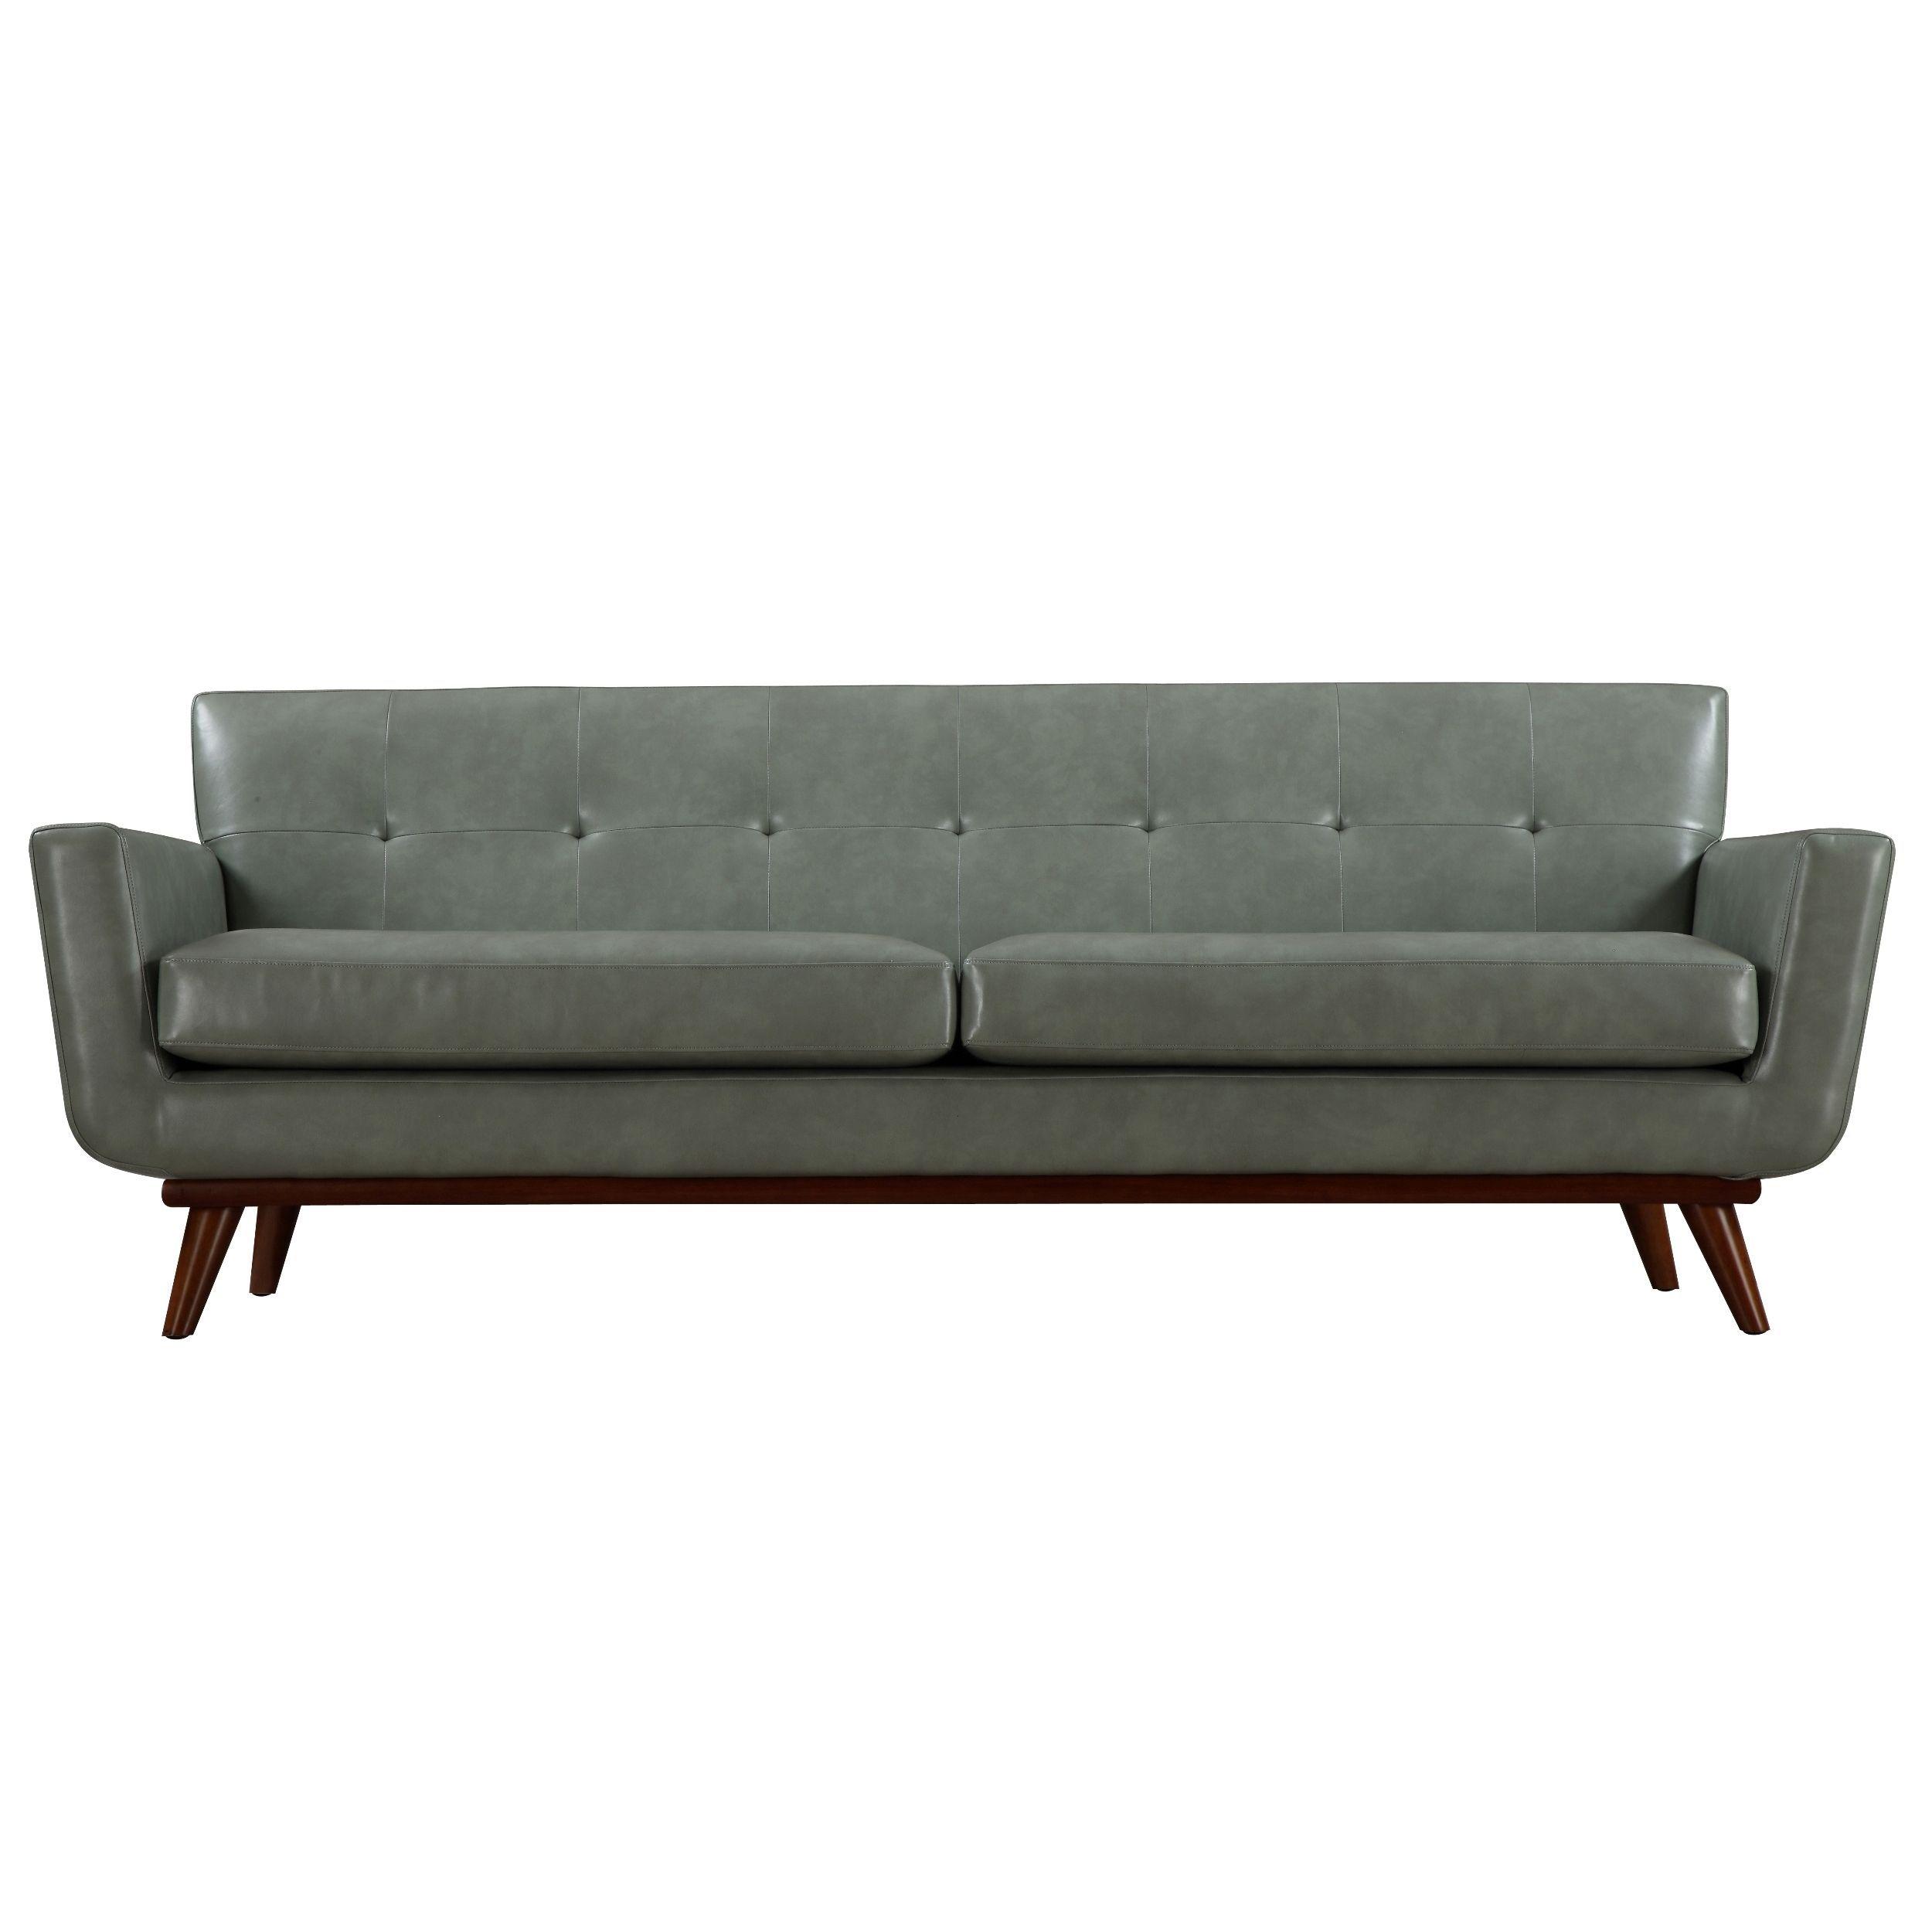 Sofa BedSleeper Sofa Tov Furniture Sofas And Loveseat Tov Furniture Tov Lyon Smoke Grey Leather Sofa Home Decor Designs